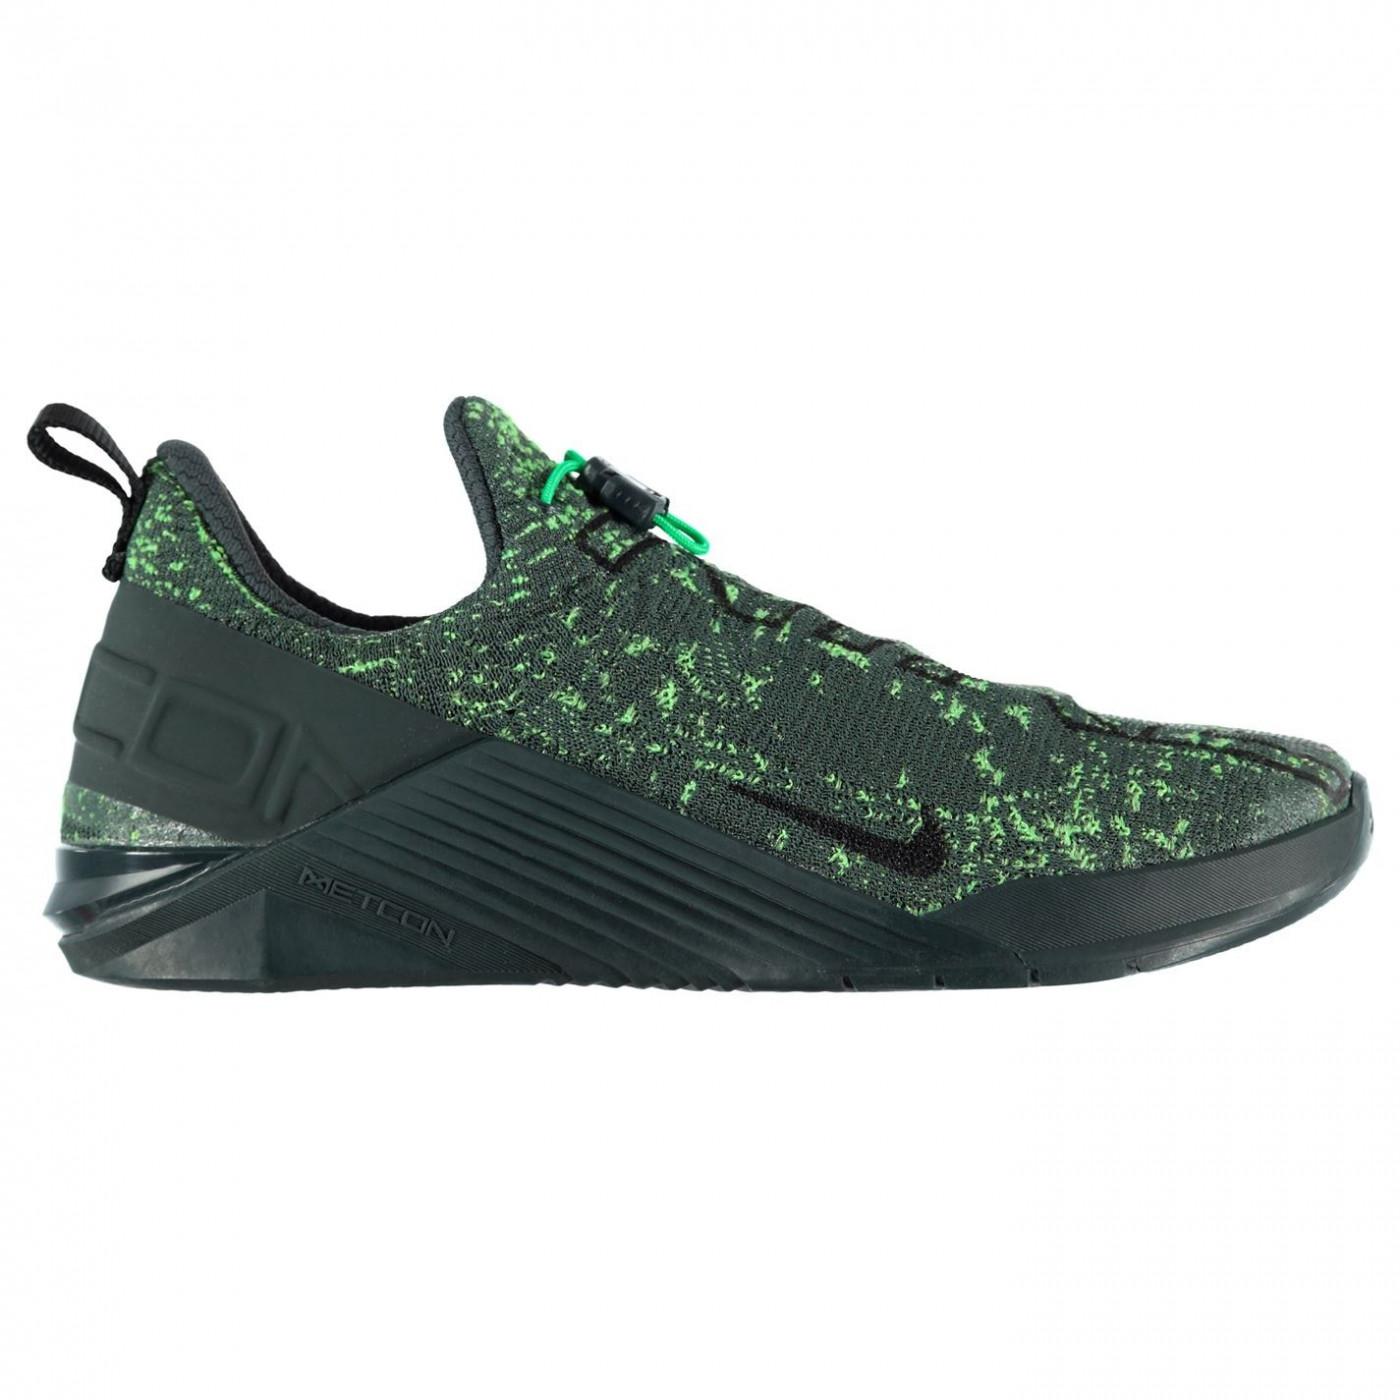 Nike Metcon Flyknit Mens Training Shoes